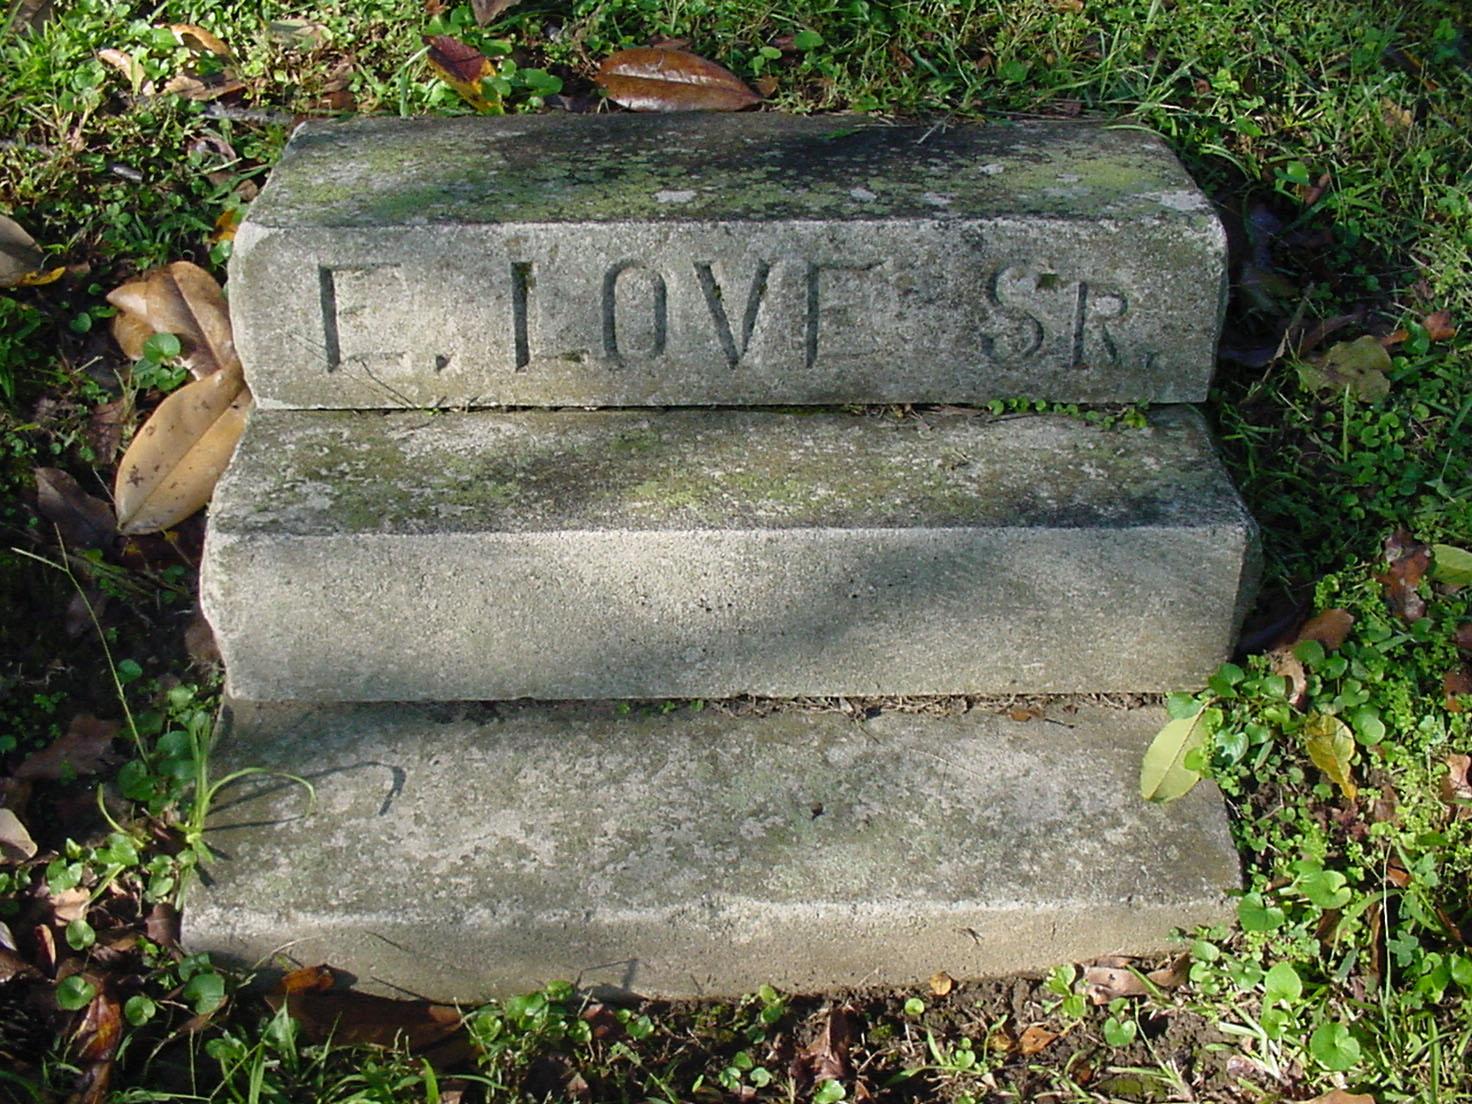 Ebzan Love's gravesite